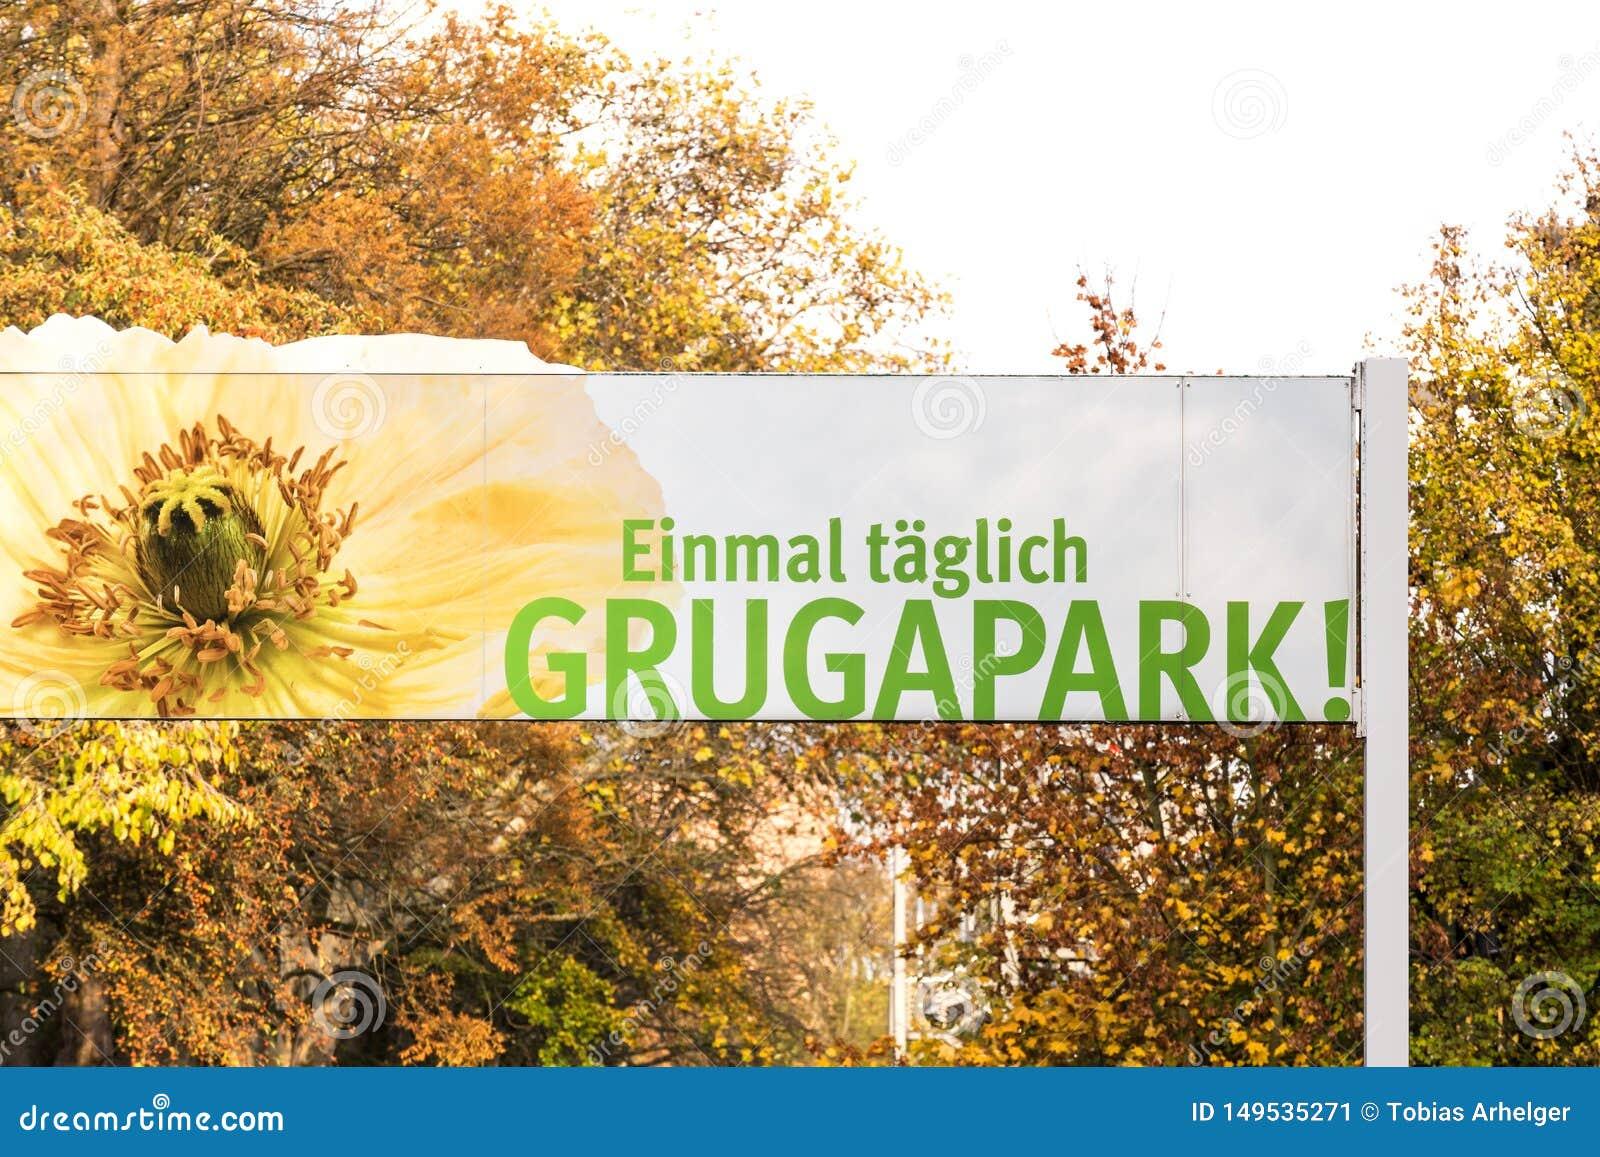 Grugapark sign in essen germany